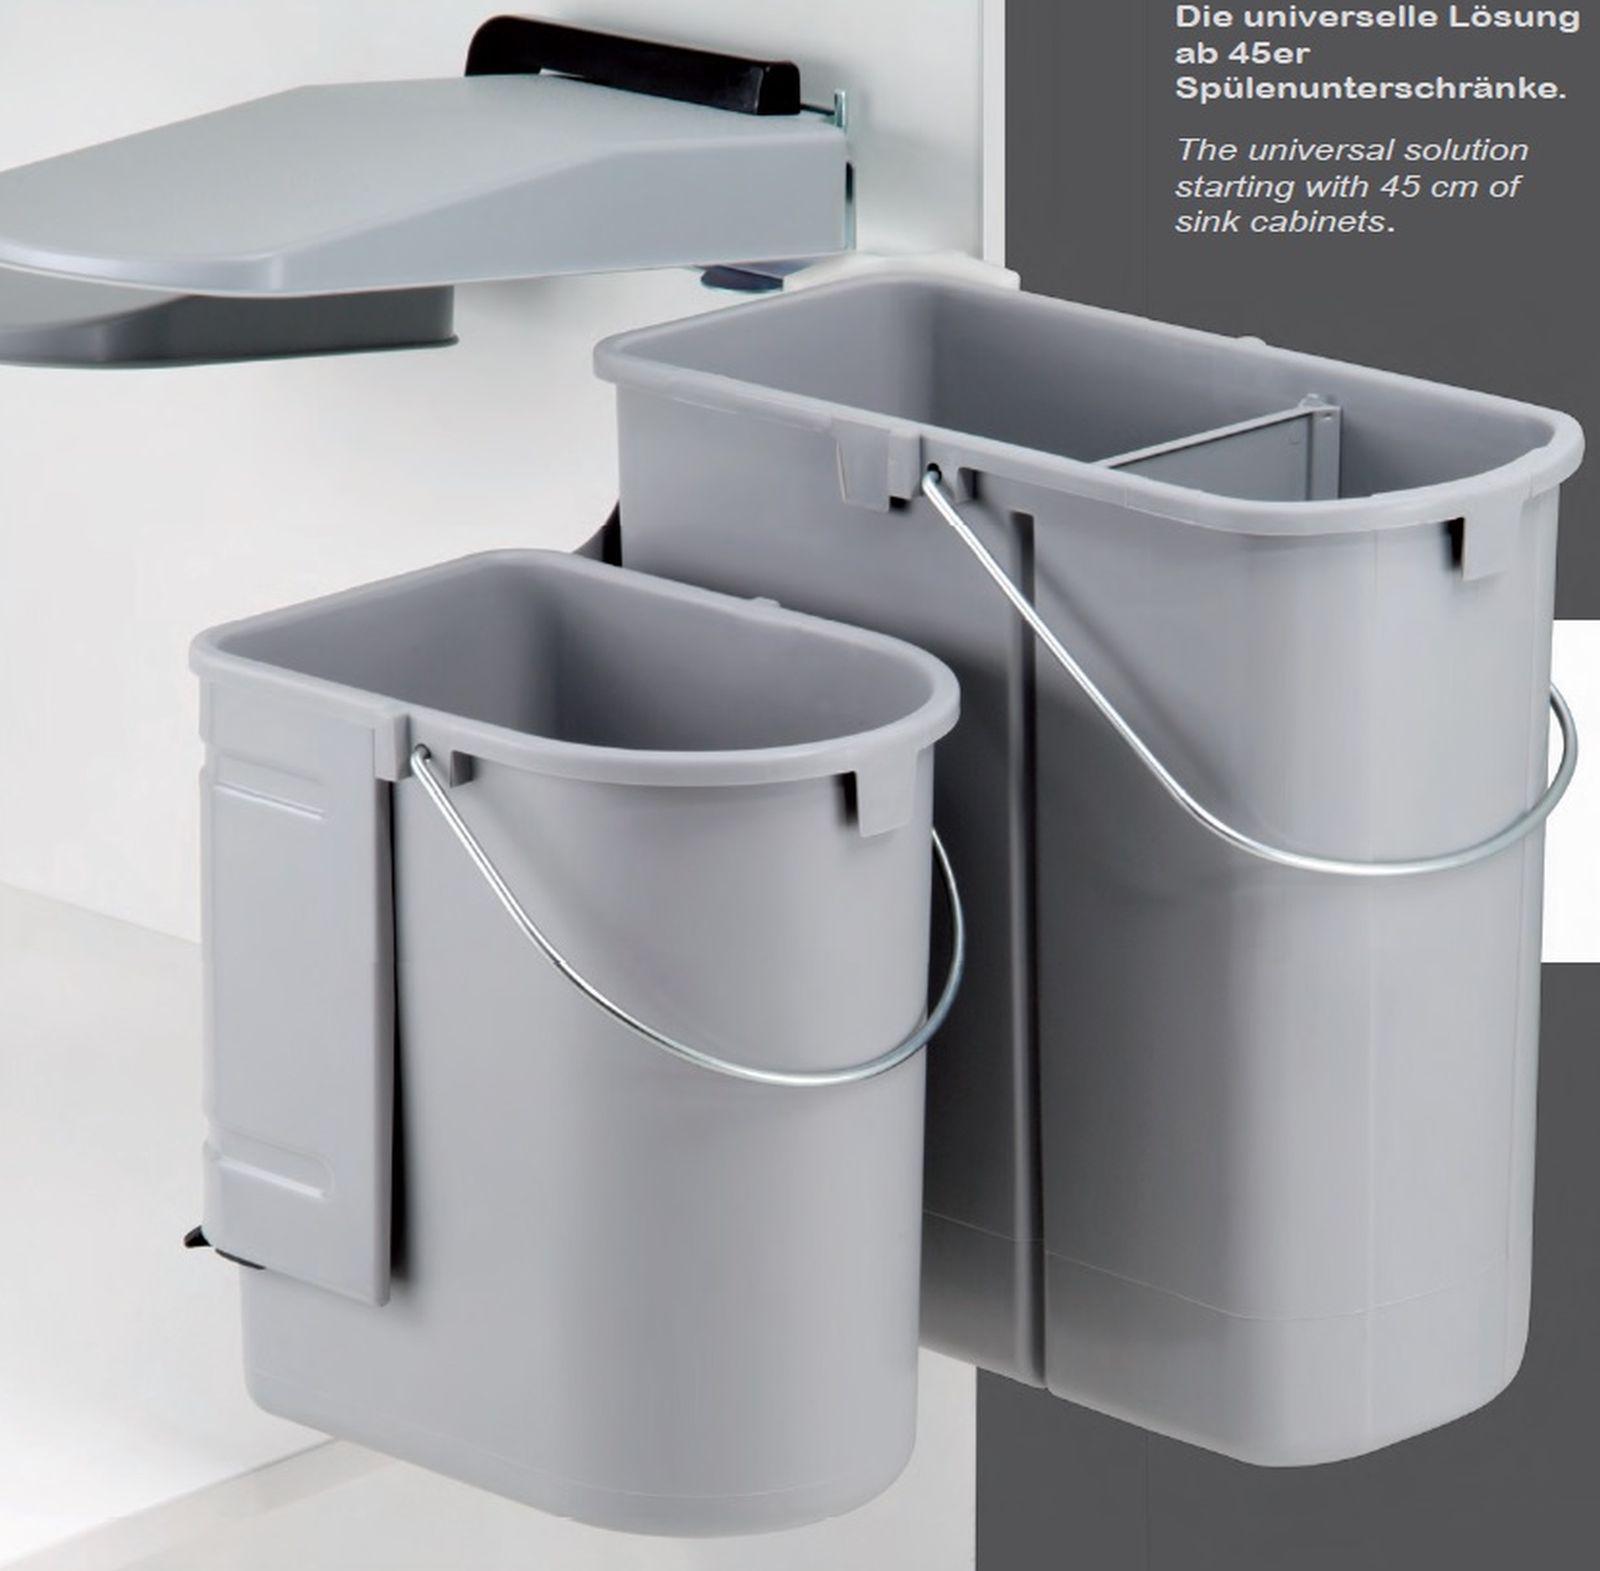 Mülleimer Küche Wesco Trennsystem